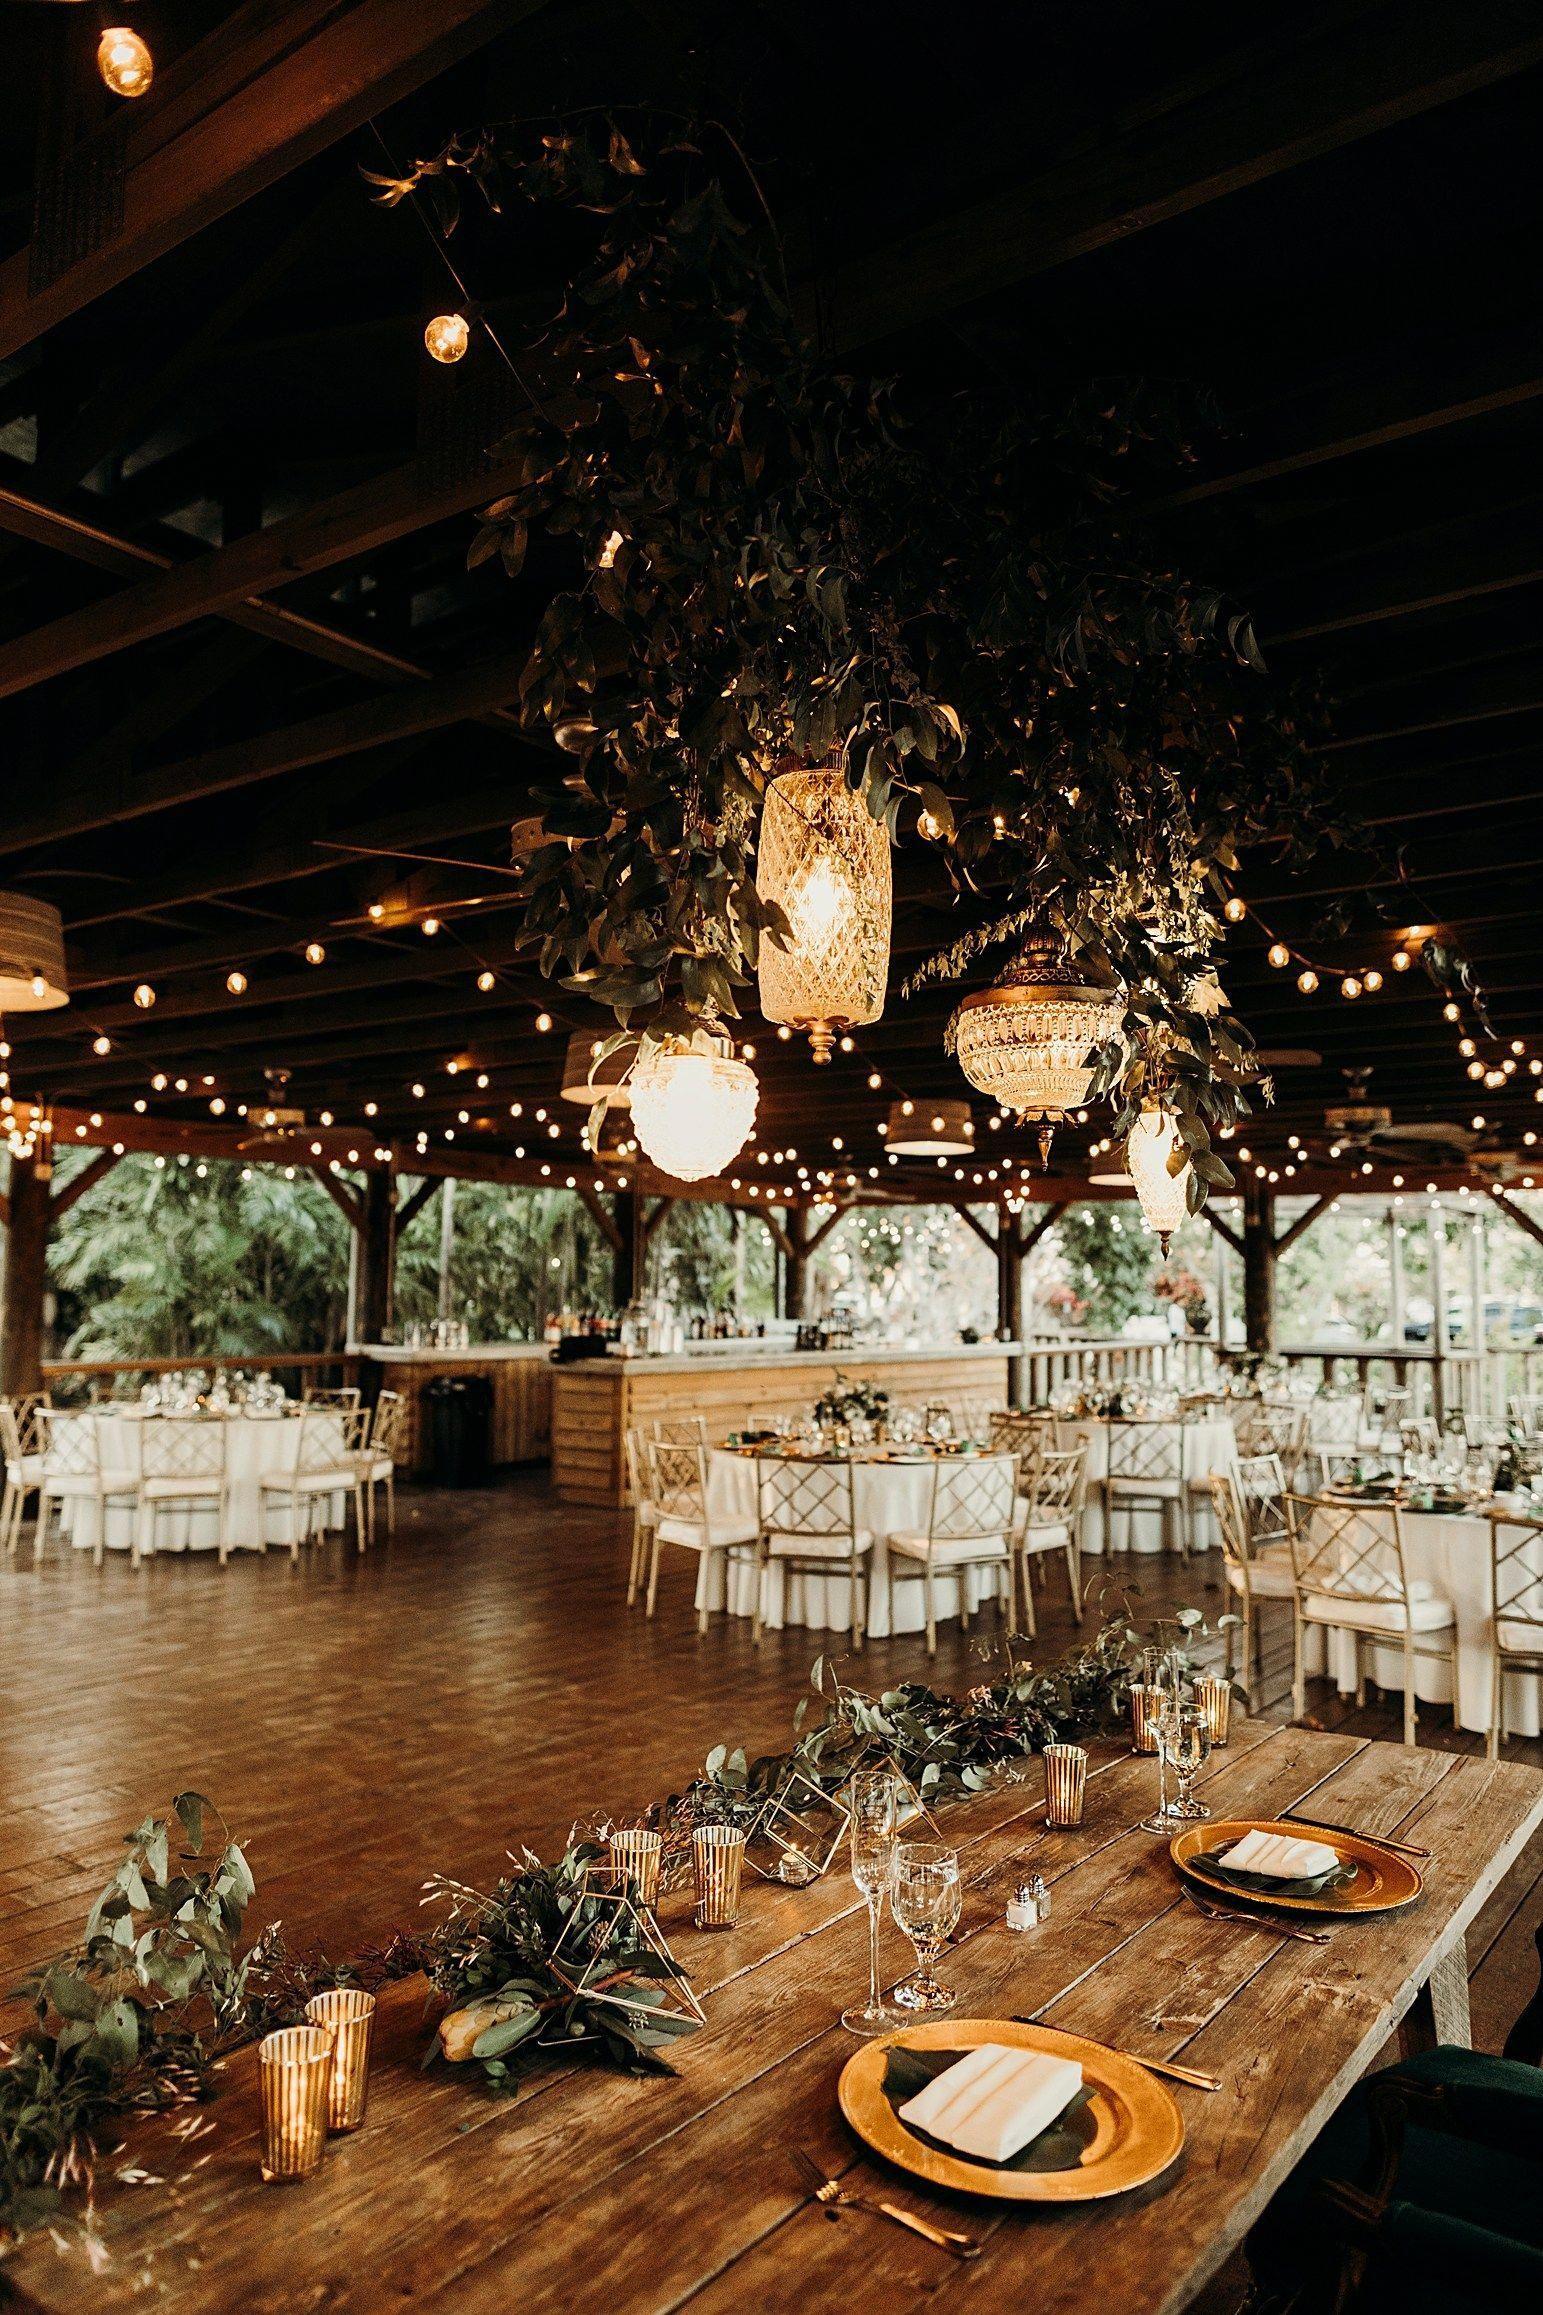 Intimate Wedding Venues Near Me Weddingwire Hotel Block Order Wedding Invitations Luxury Up Wedding Ring Vintage Wedding Venues Wedding Venues Garden Wedding